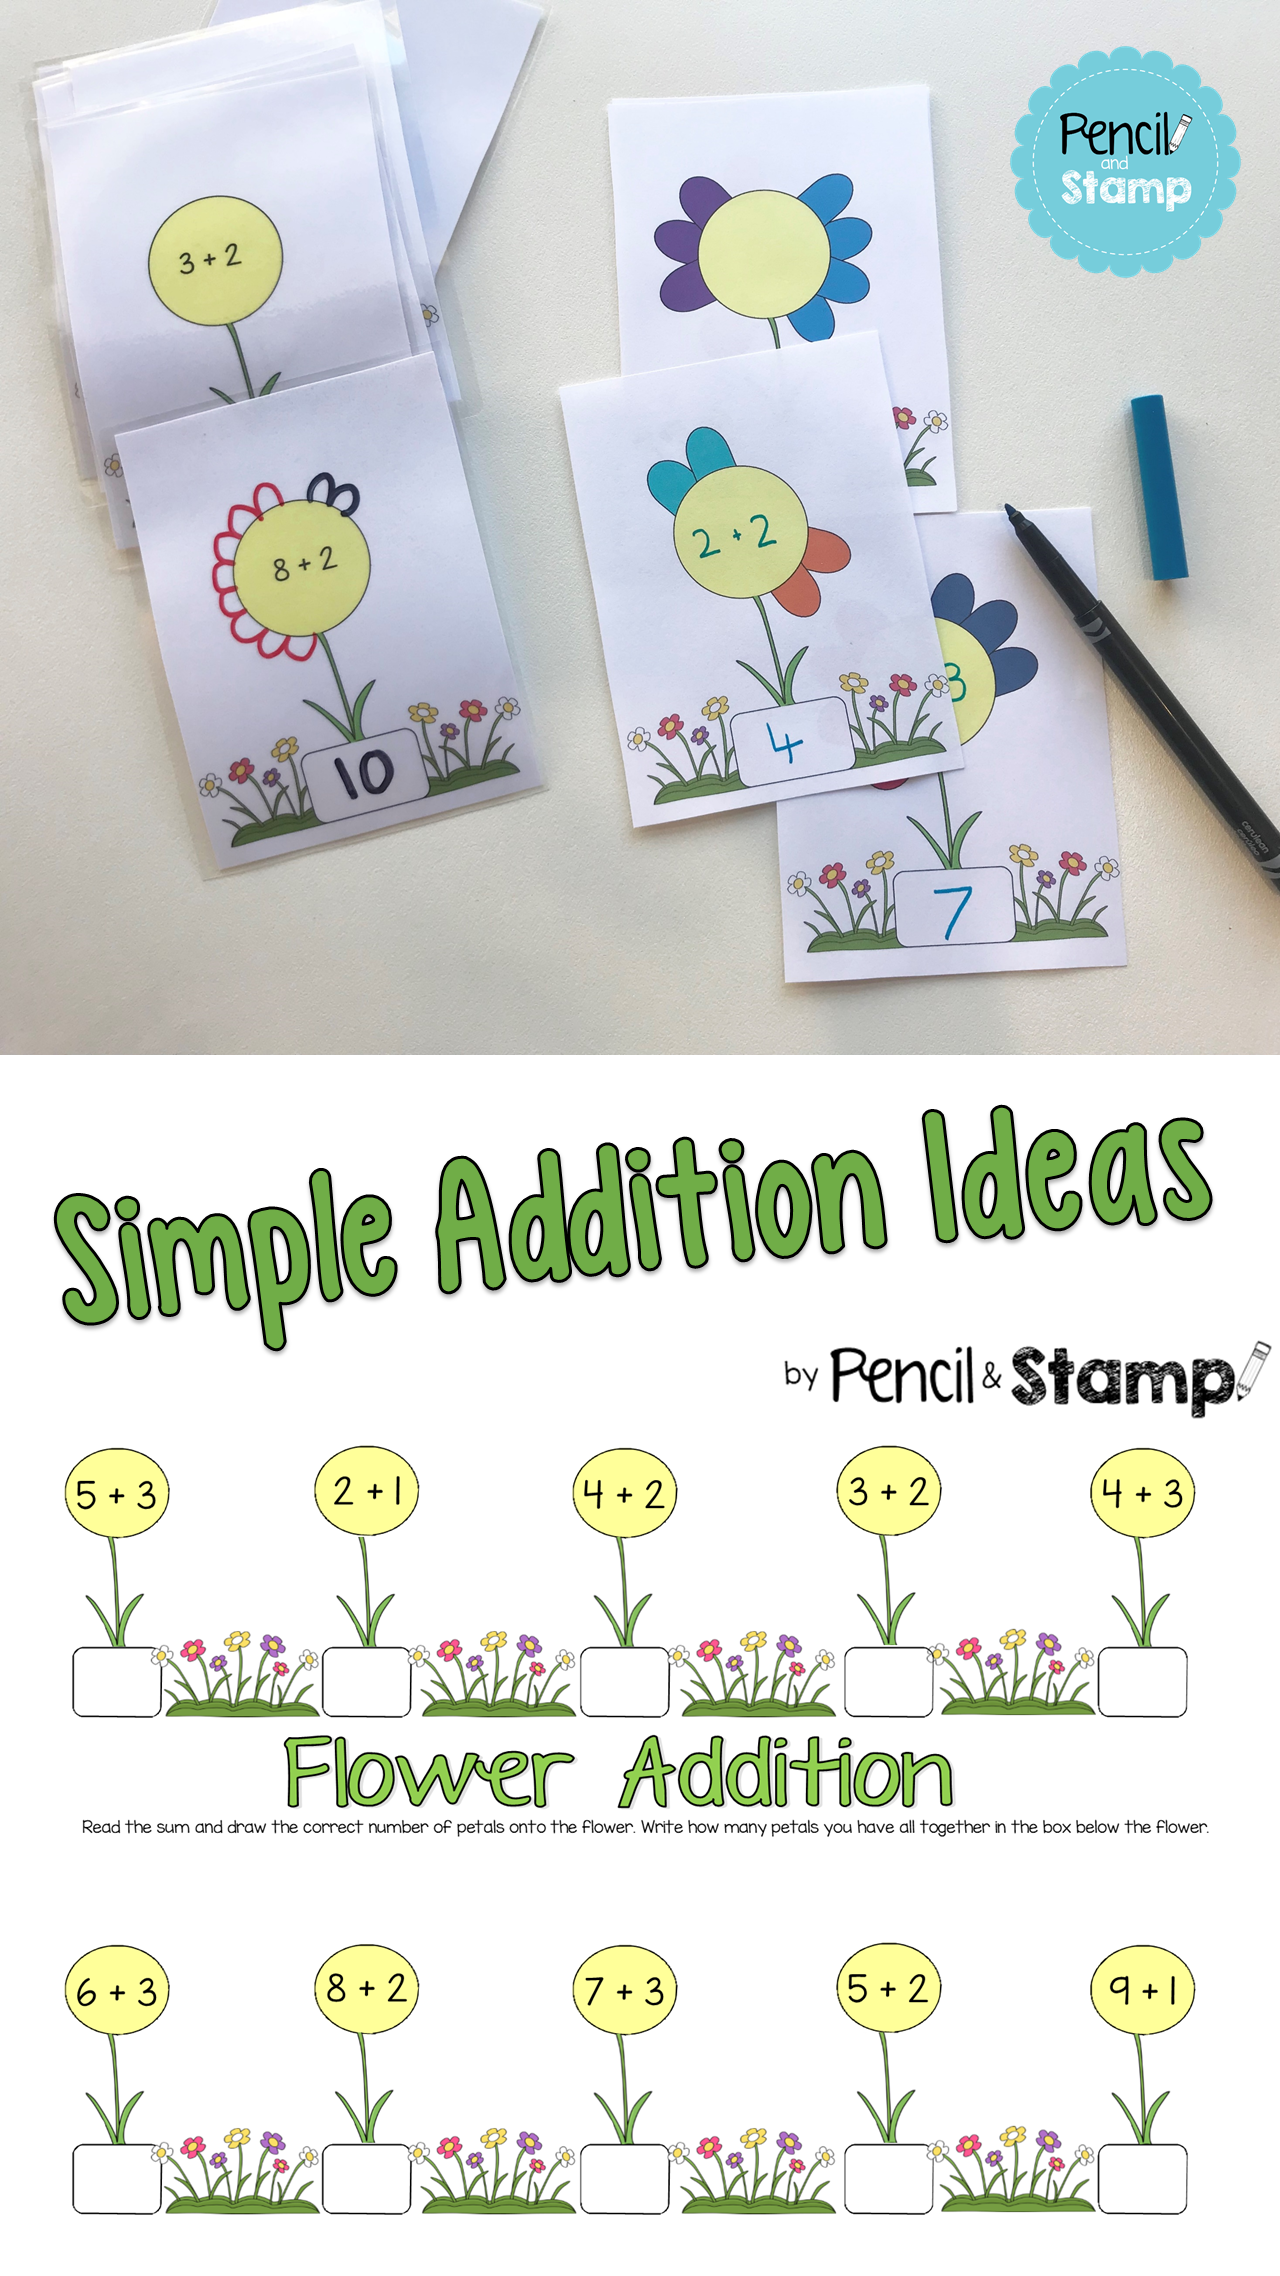 Flower Addition Kindergarten Ideas And Activities Simple